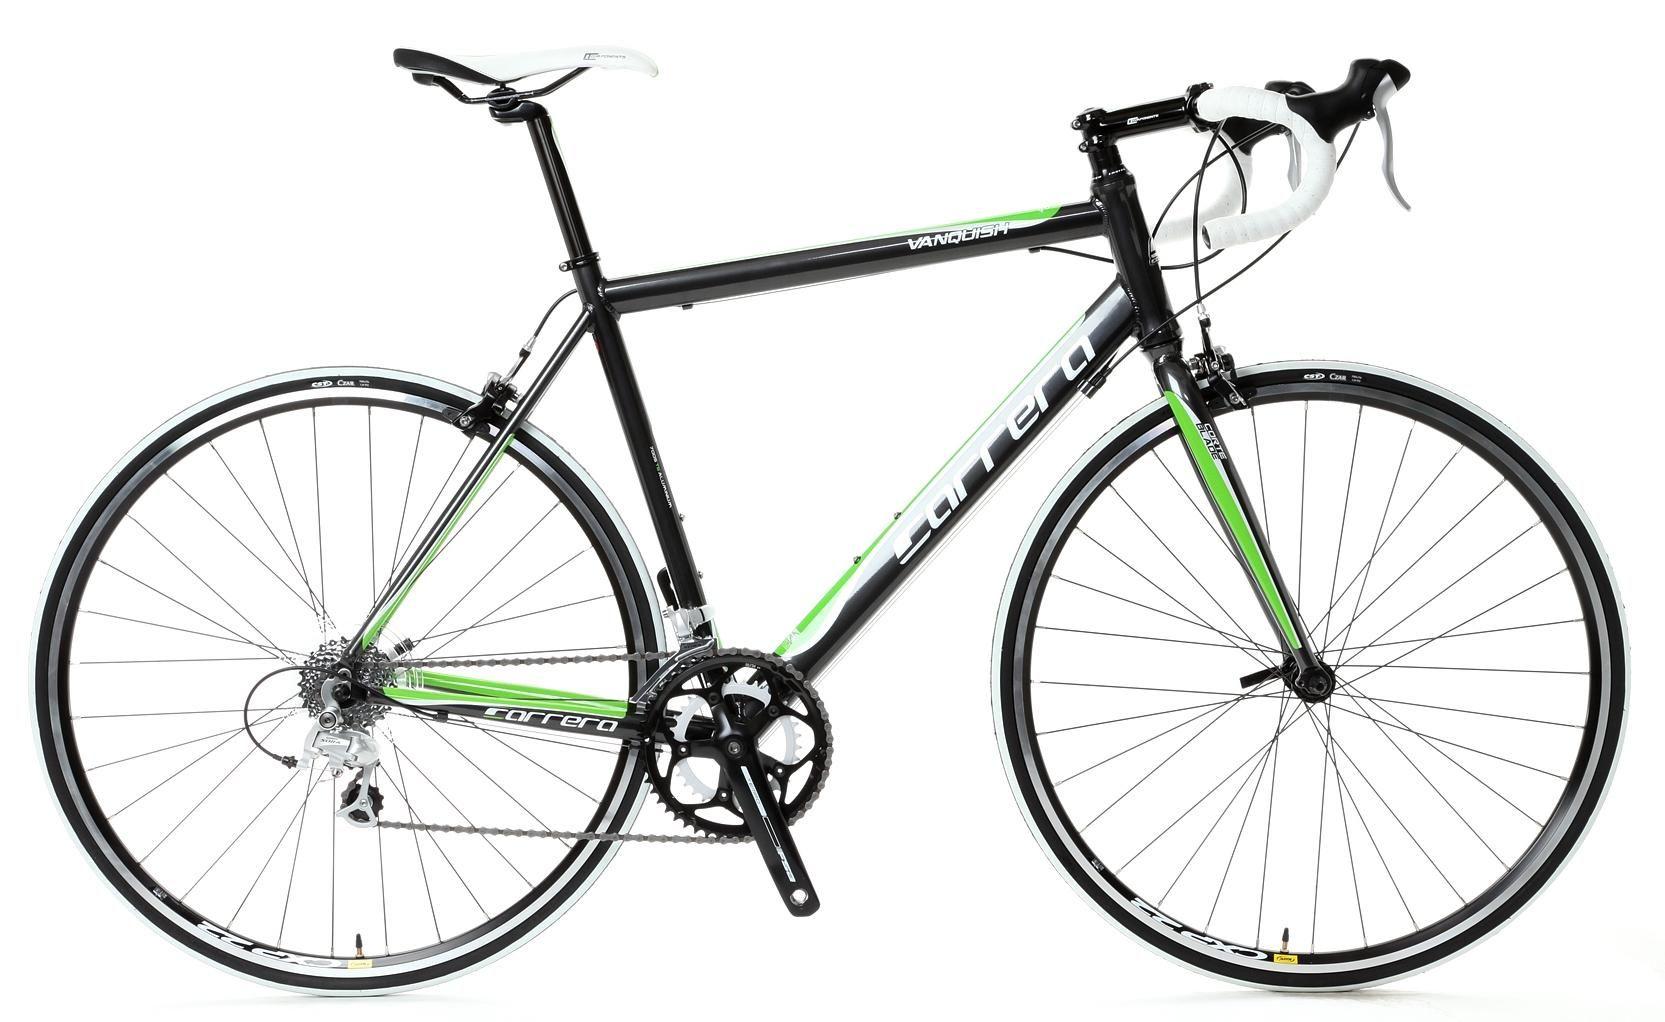 Featuring a terrific spec and design, the Carrera Vanquish Road Bike